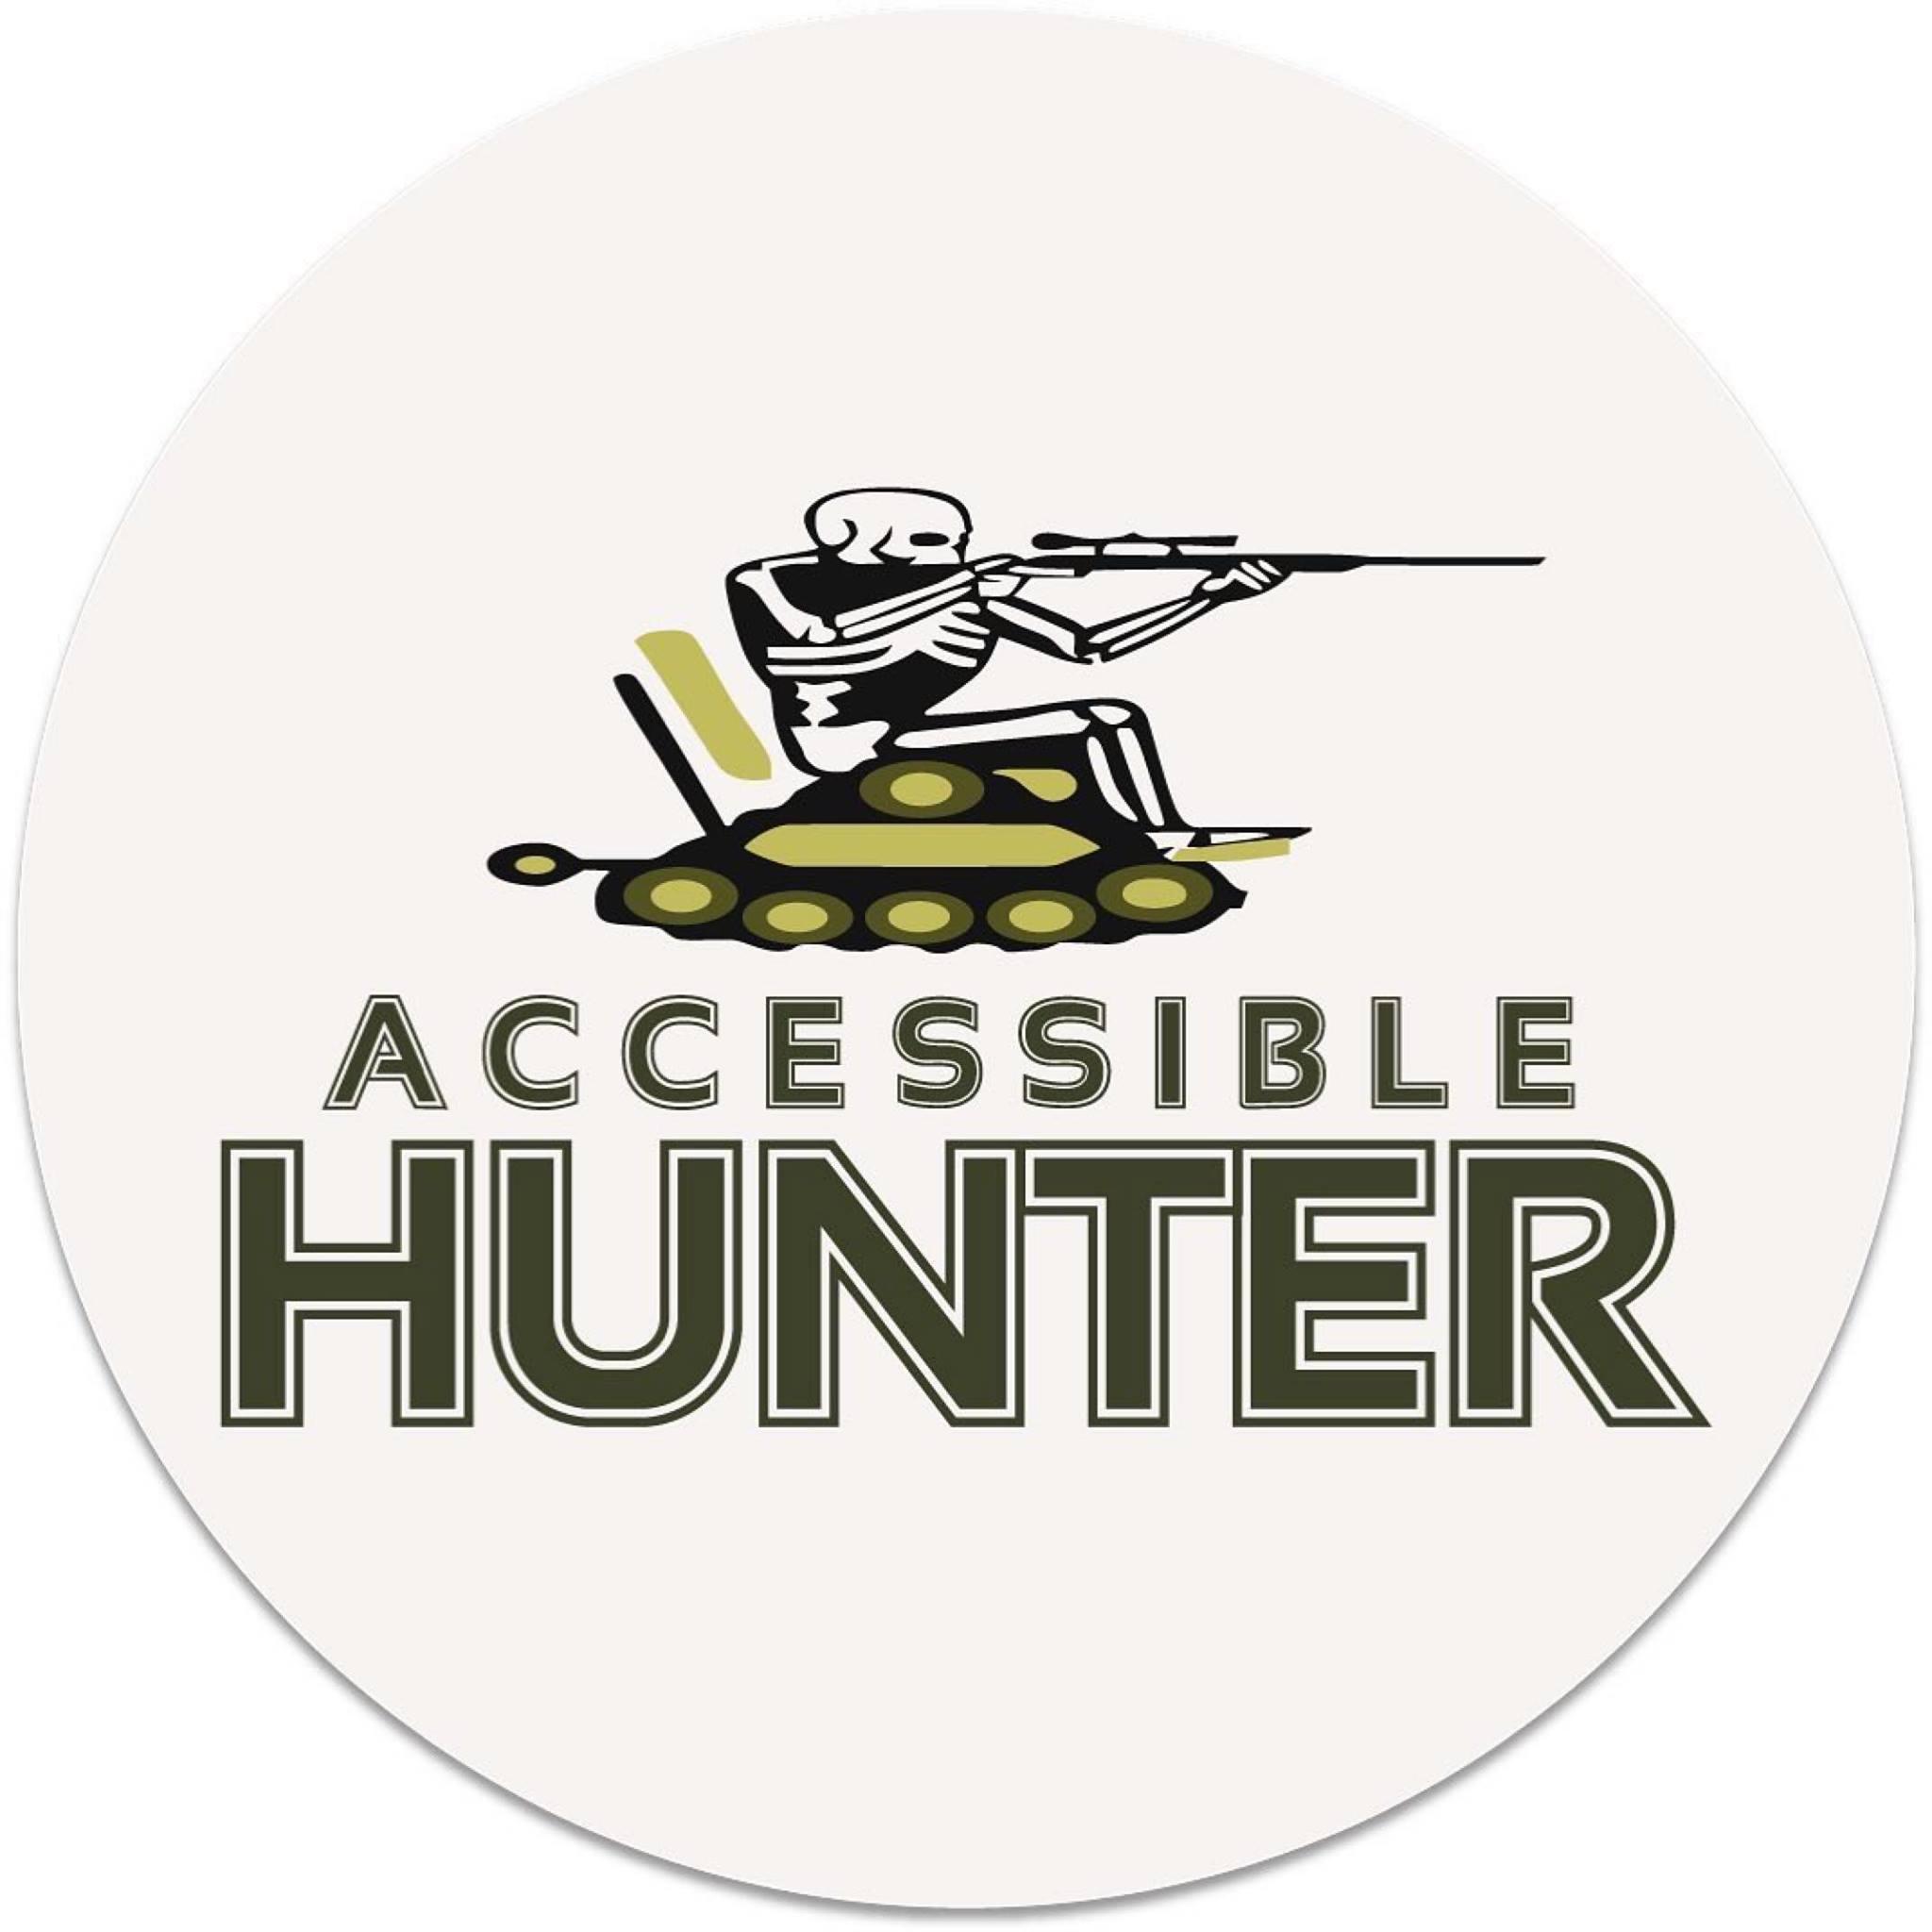 https://wildjaeger.com/wp-content/uploads/2021/03/Accessible-Hunter-05.jpg